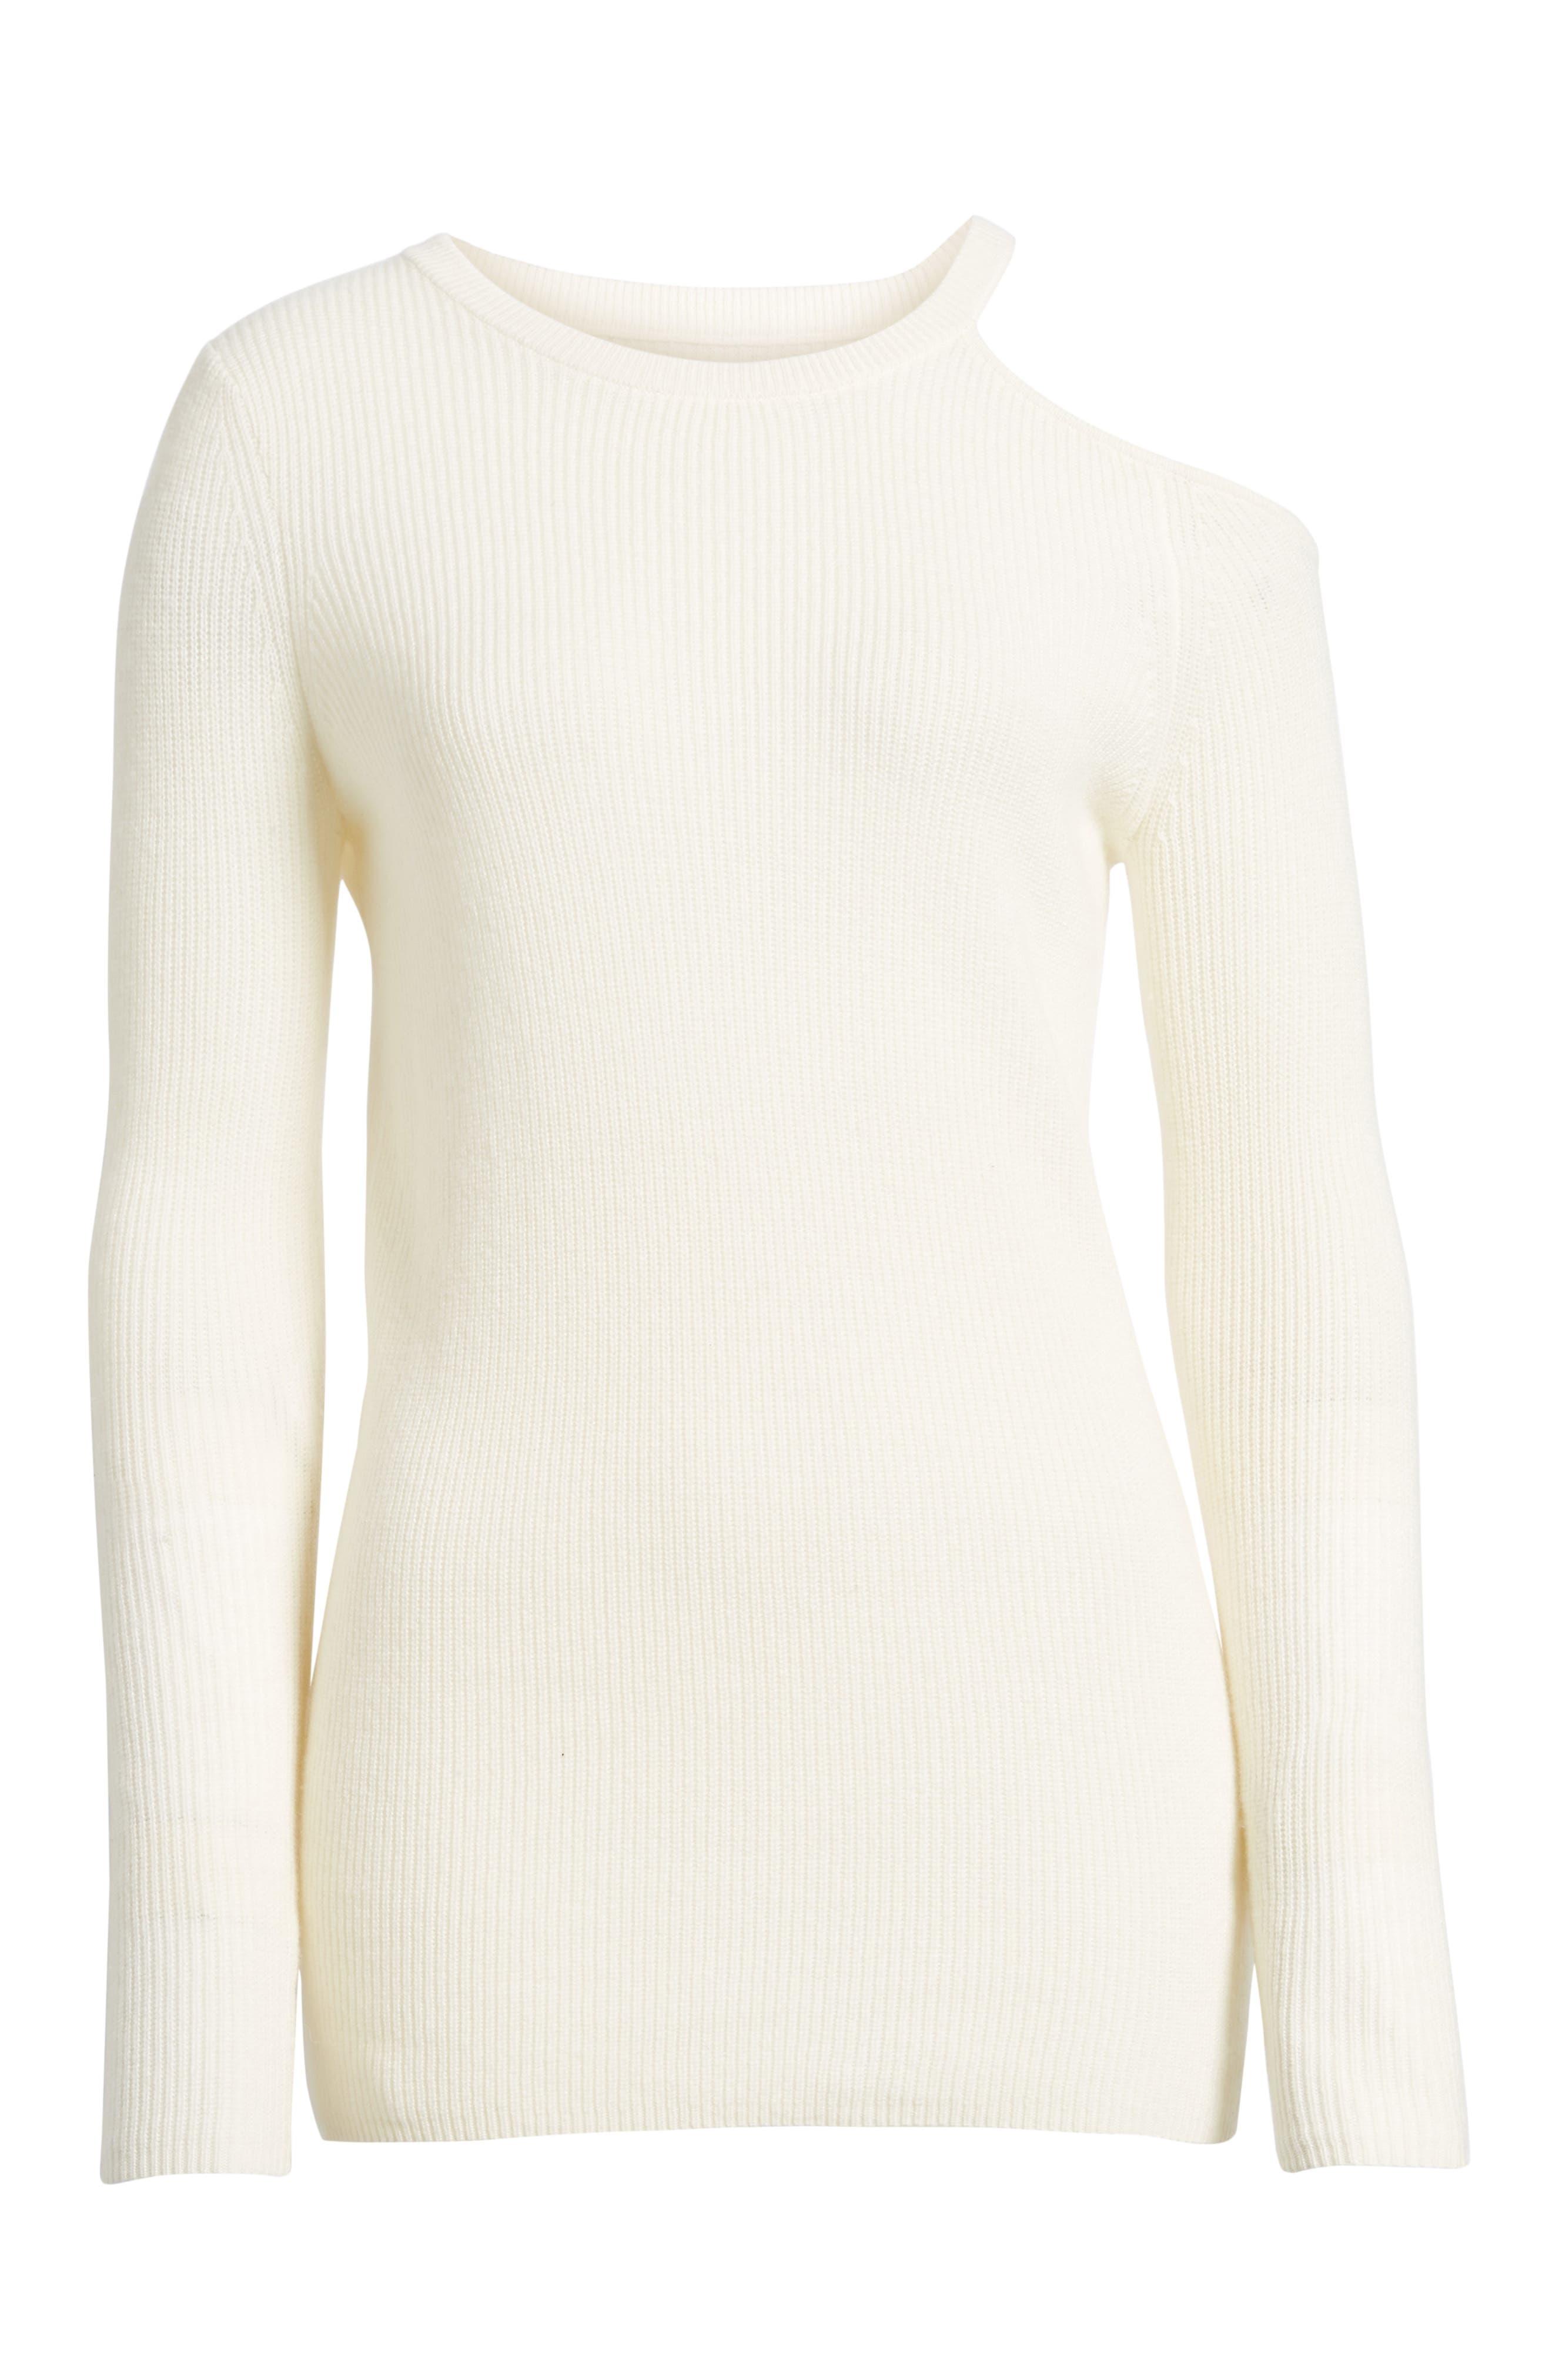 Cold Shoulder Cashmere Sweater,                             Alternate thumbnail 6, color,                             905